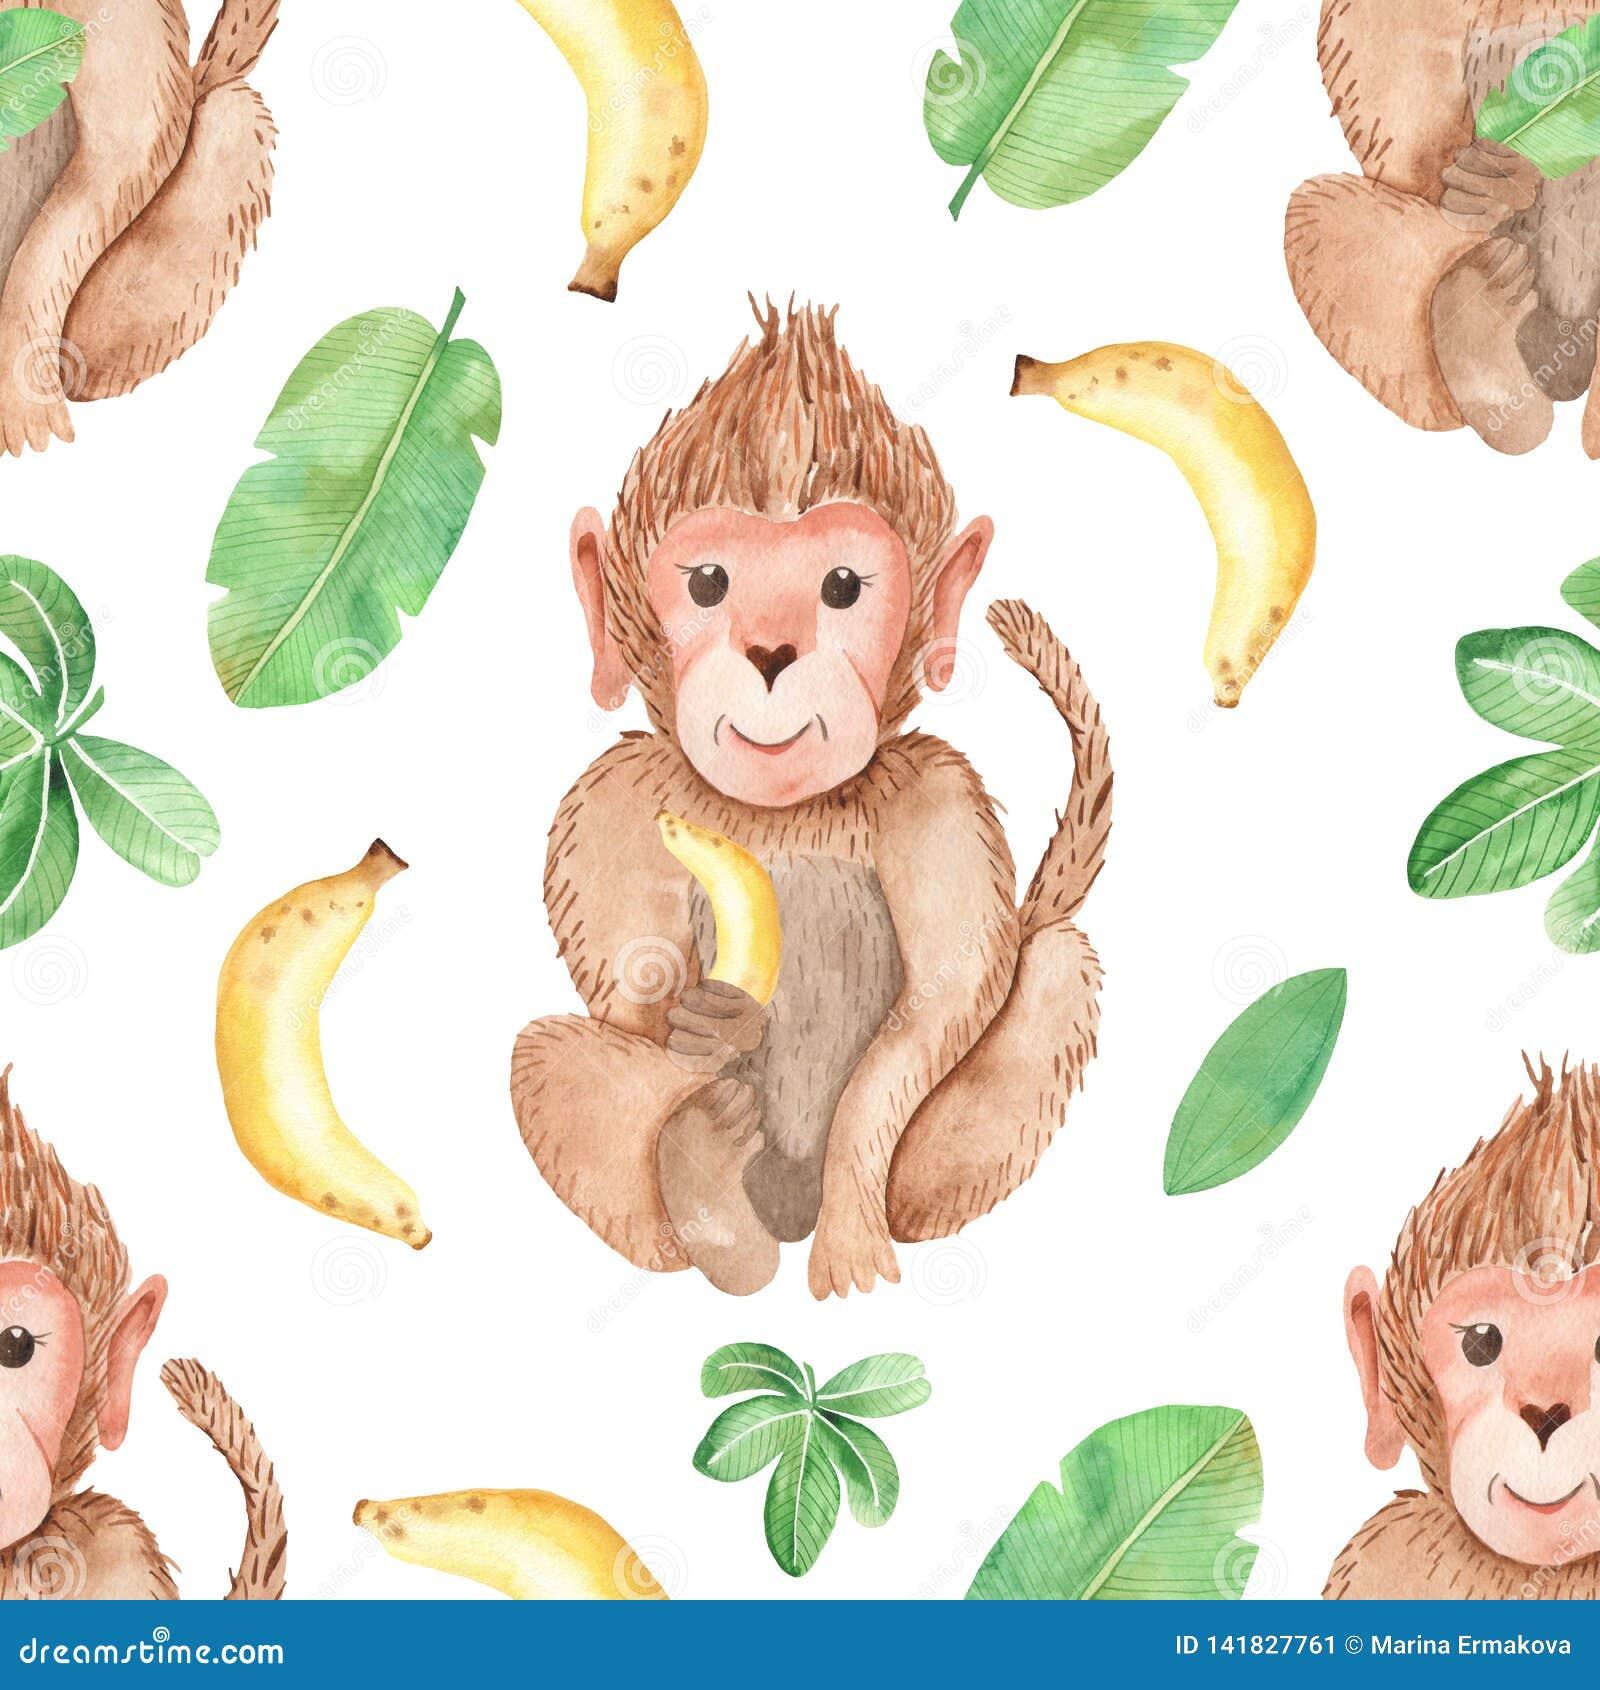 Monkeys Bananas Vines Pink Fabric